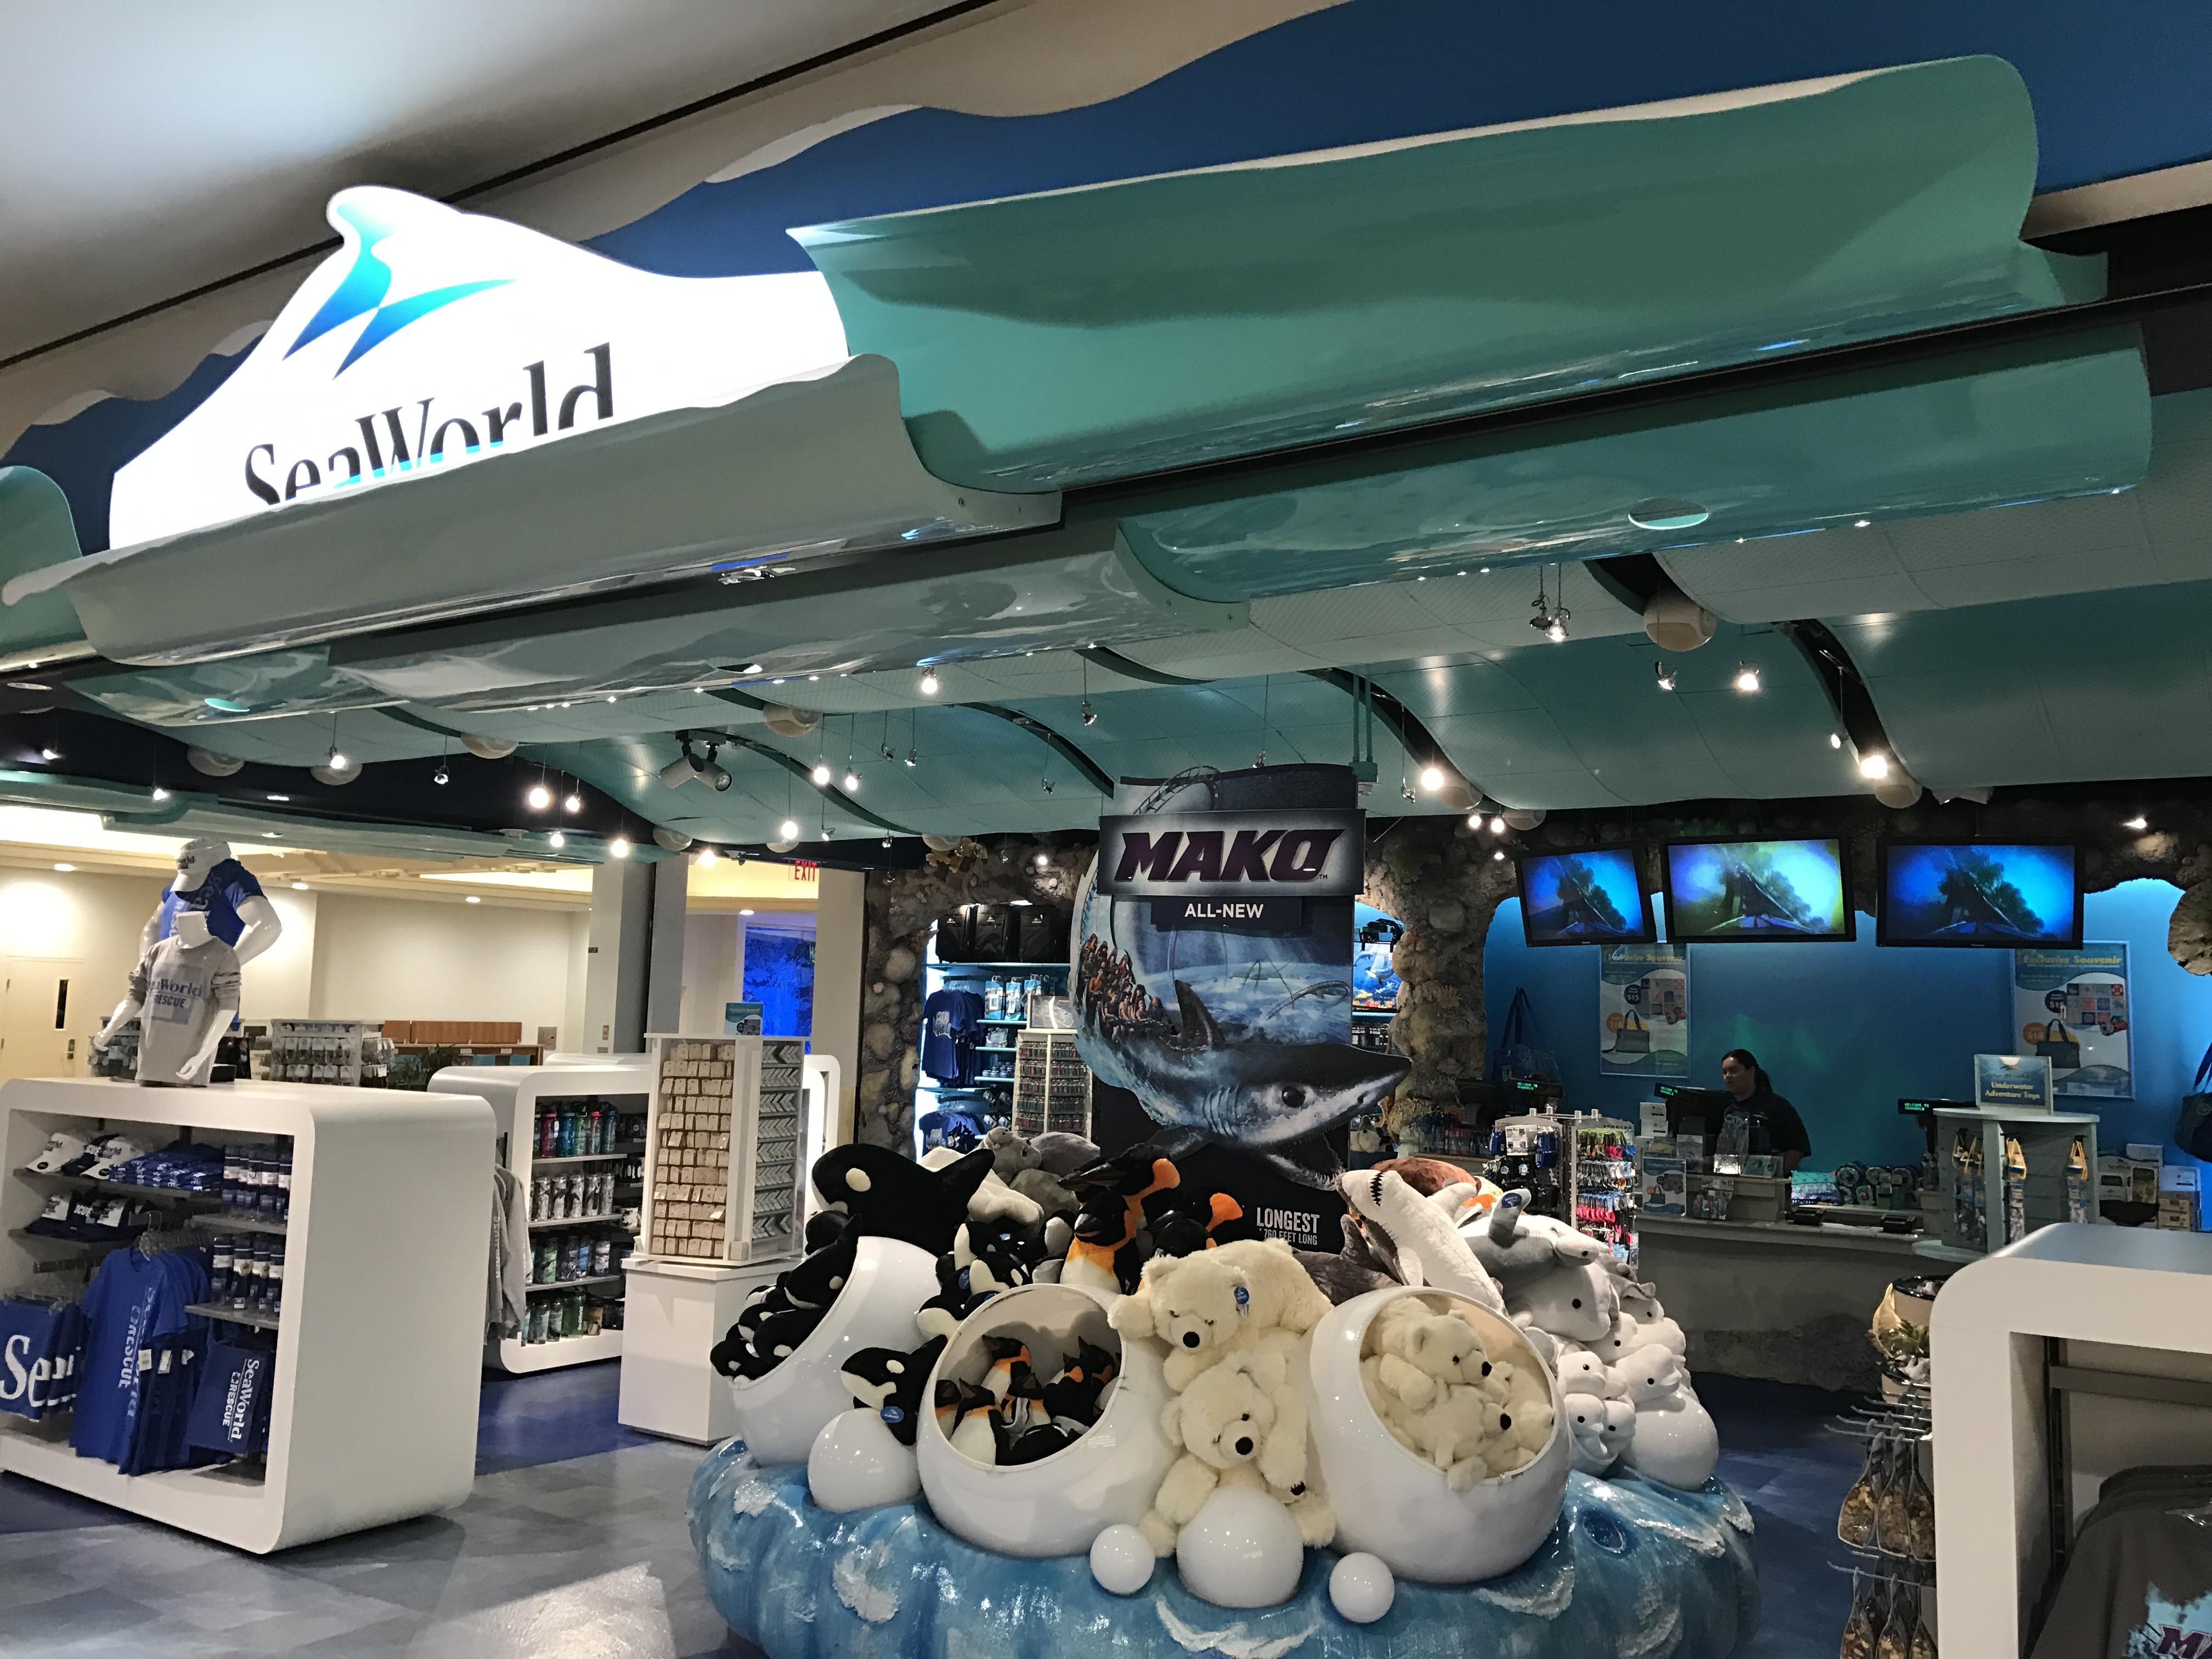 Seaworld Gift Shop in Orlando Airport – Orlando, FL | David's Coin ...